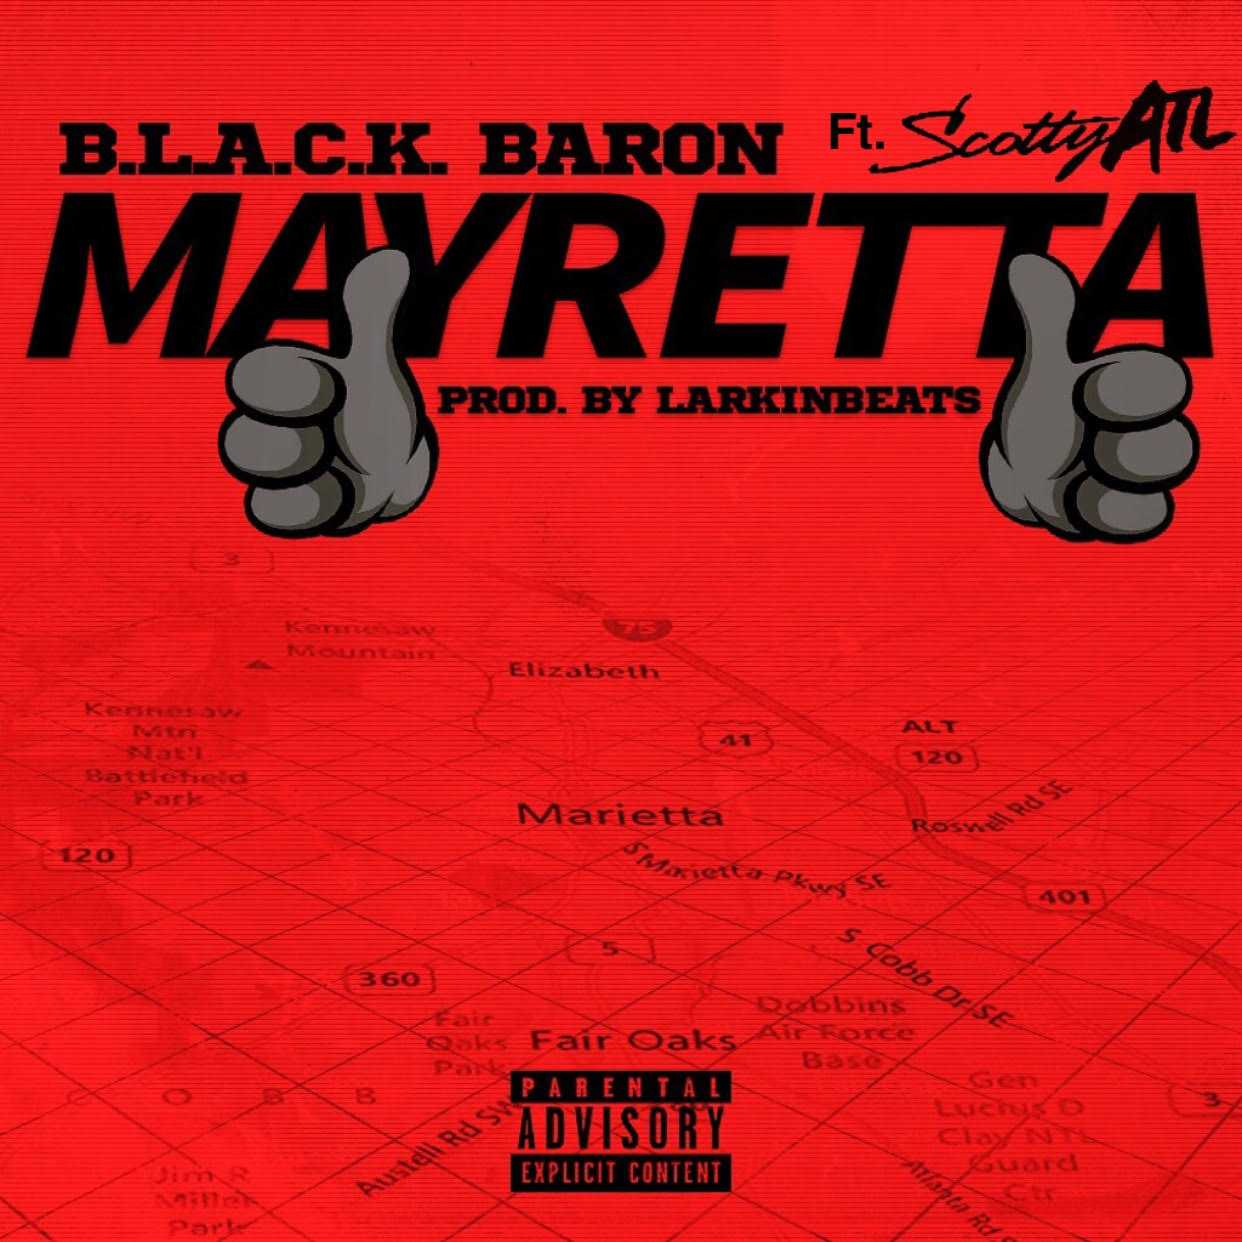 "B.L.A.C.K Baron and Scotty ATL – ""Mayretta"" (Remix) [Audio]"